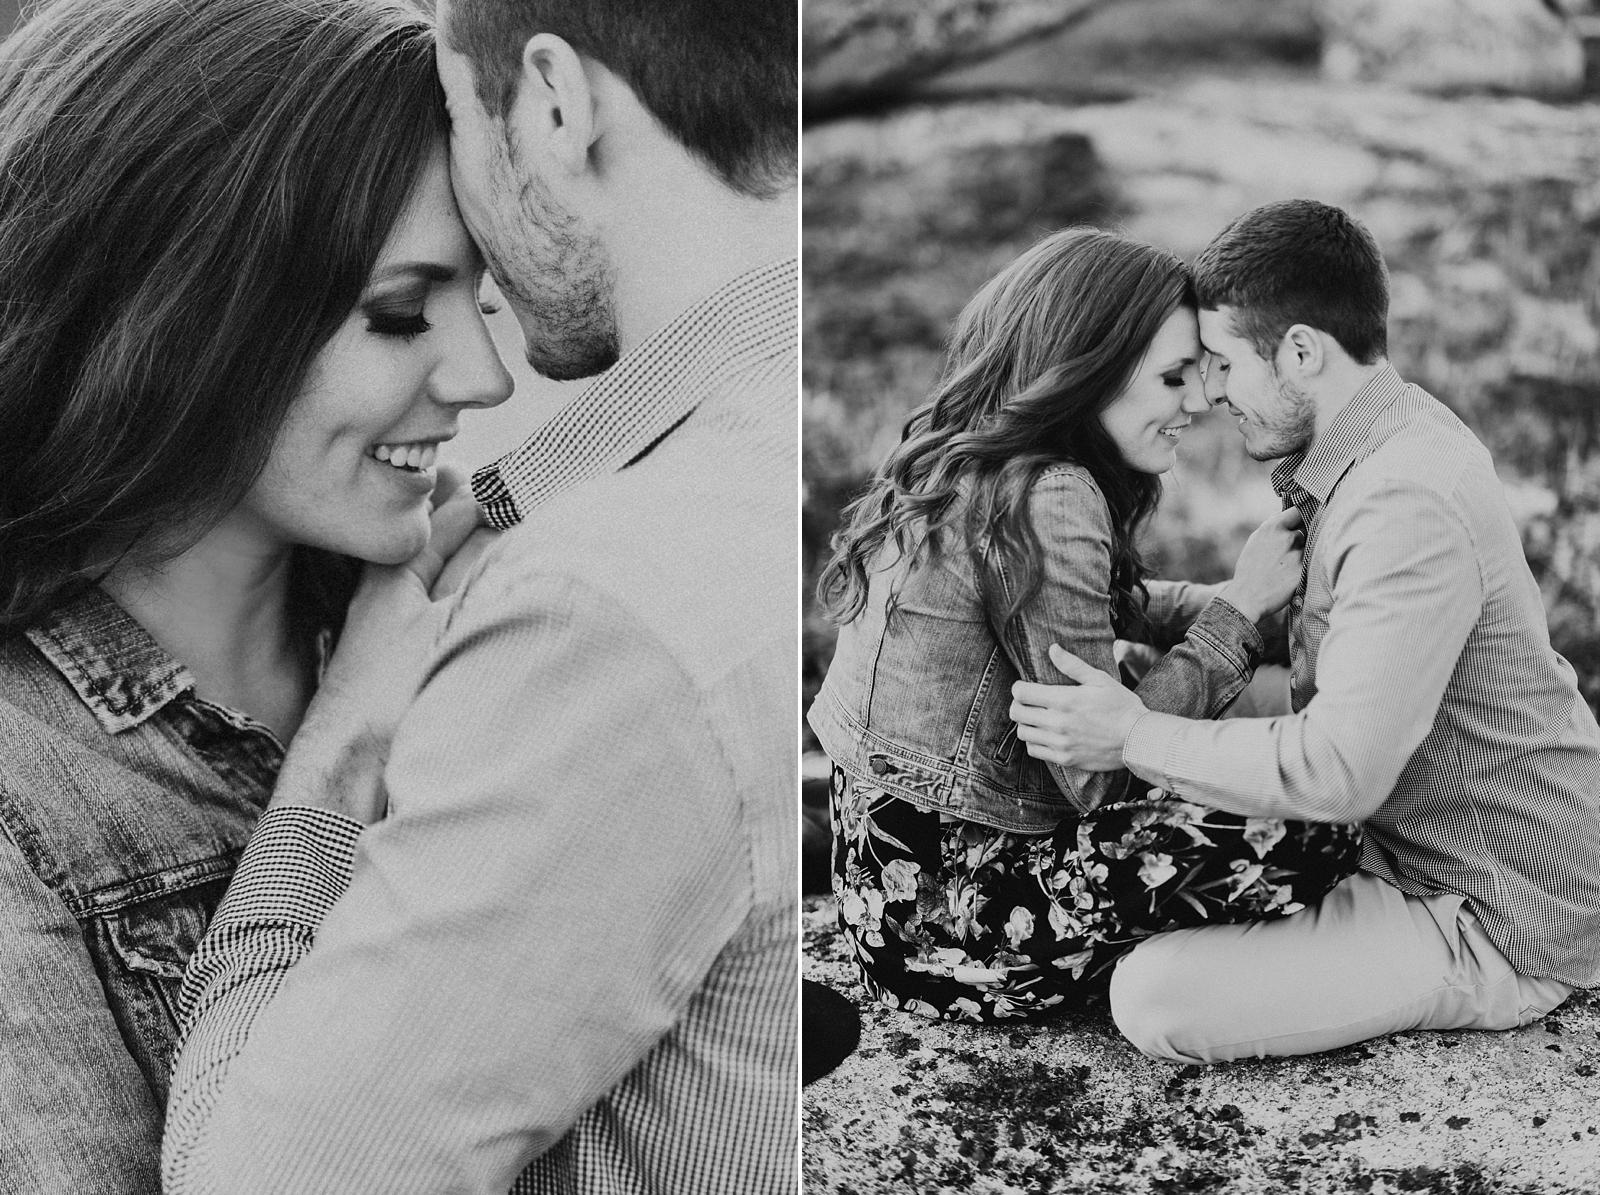 Halifax-Wedding-Photographer_Annie&Ryan_Ocean-Engagement-Shoot_35.jpg